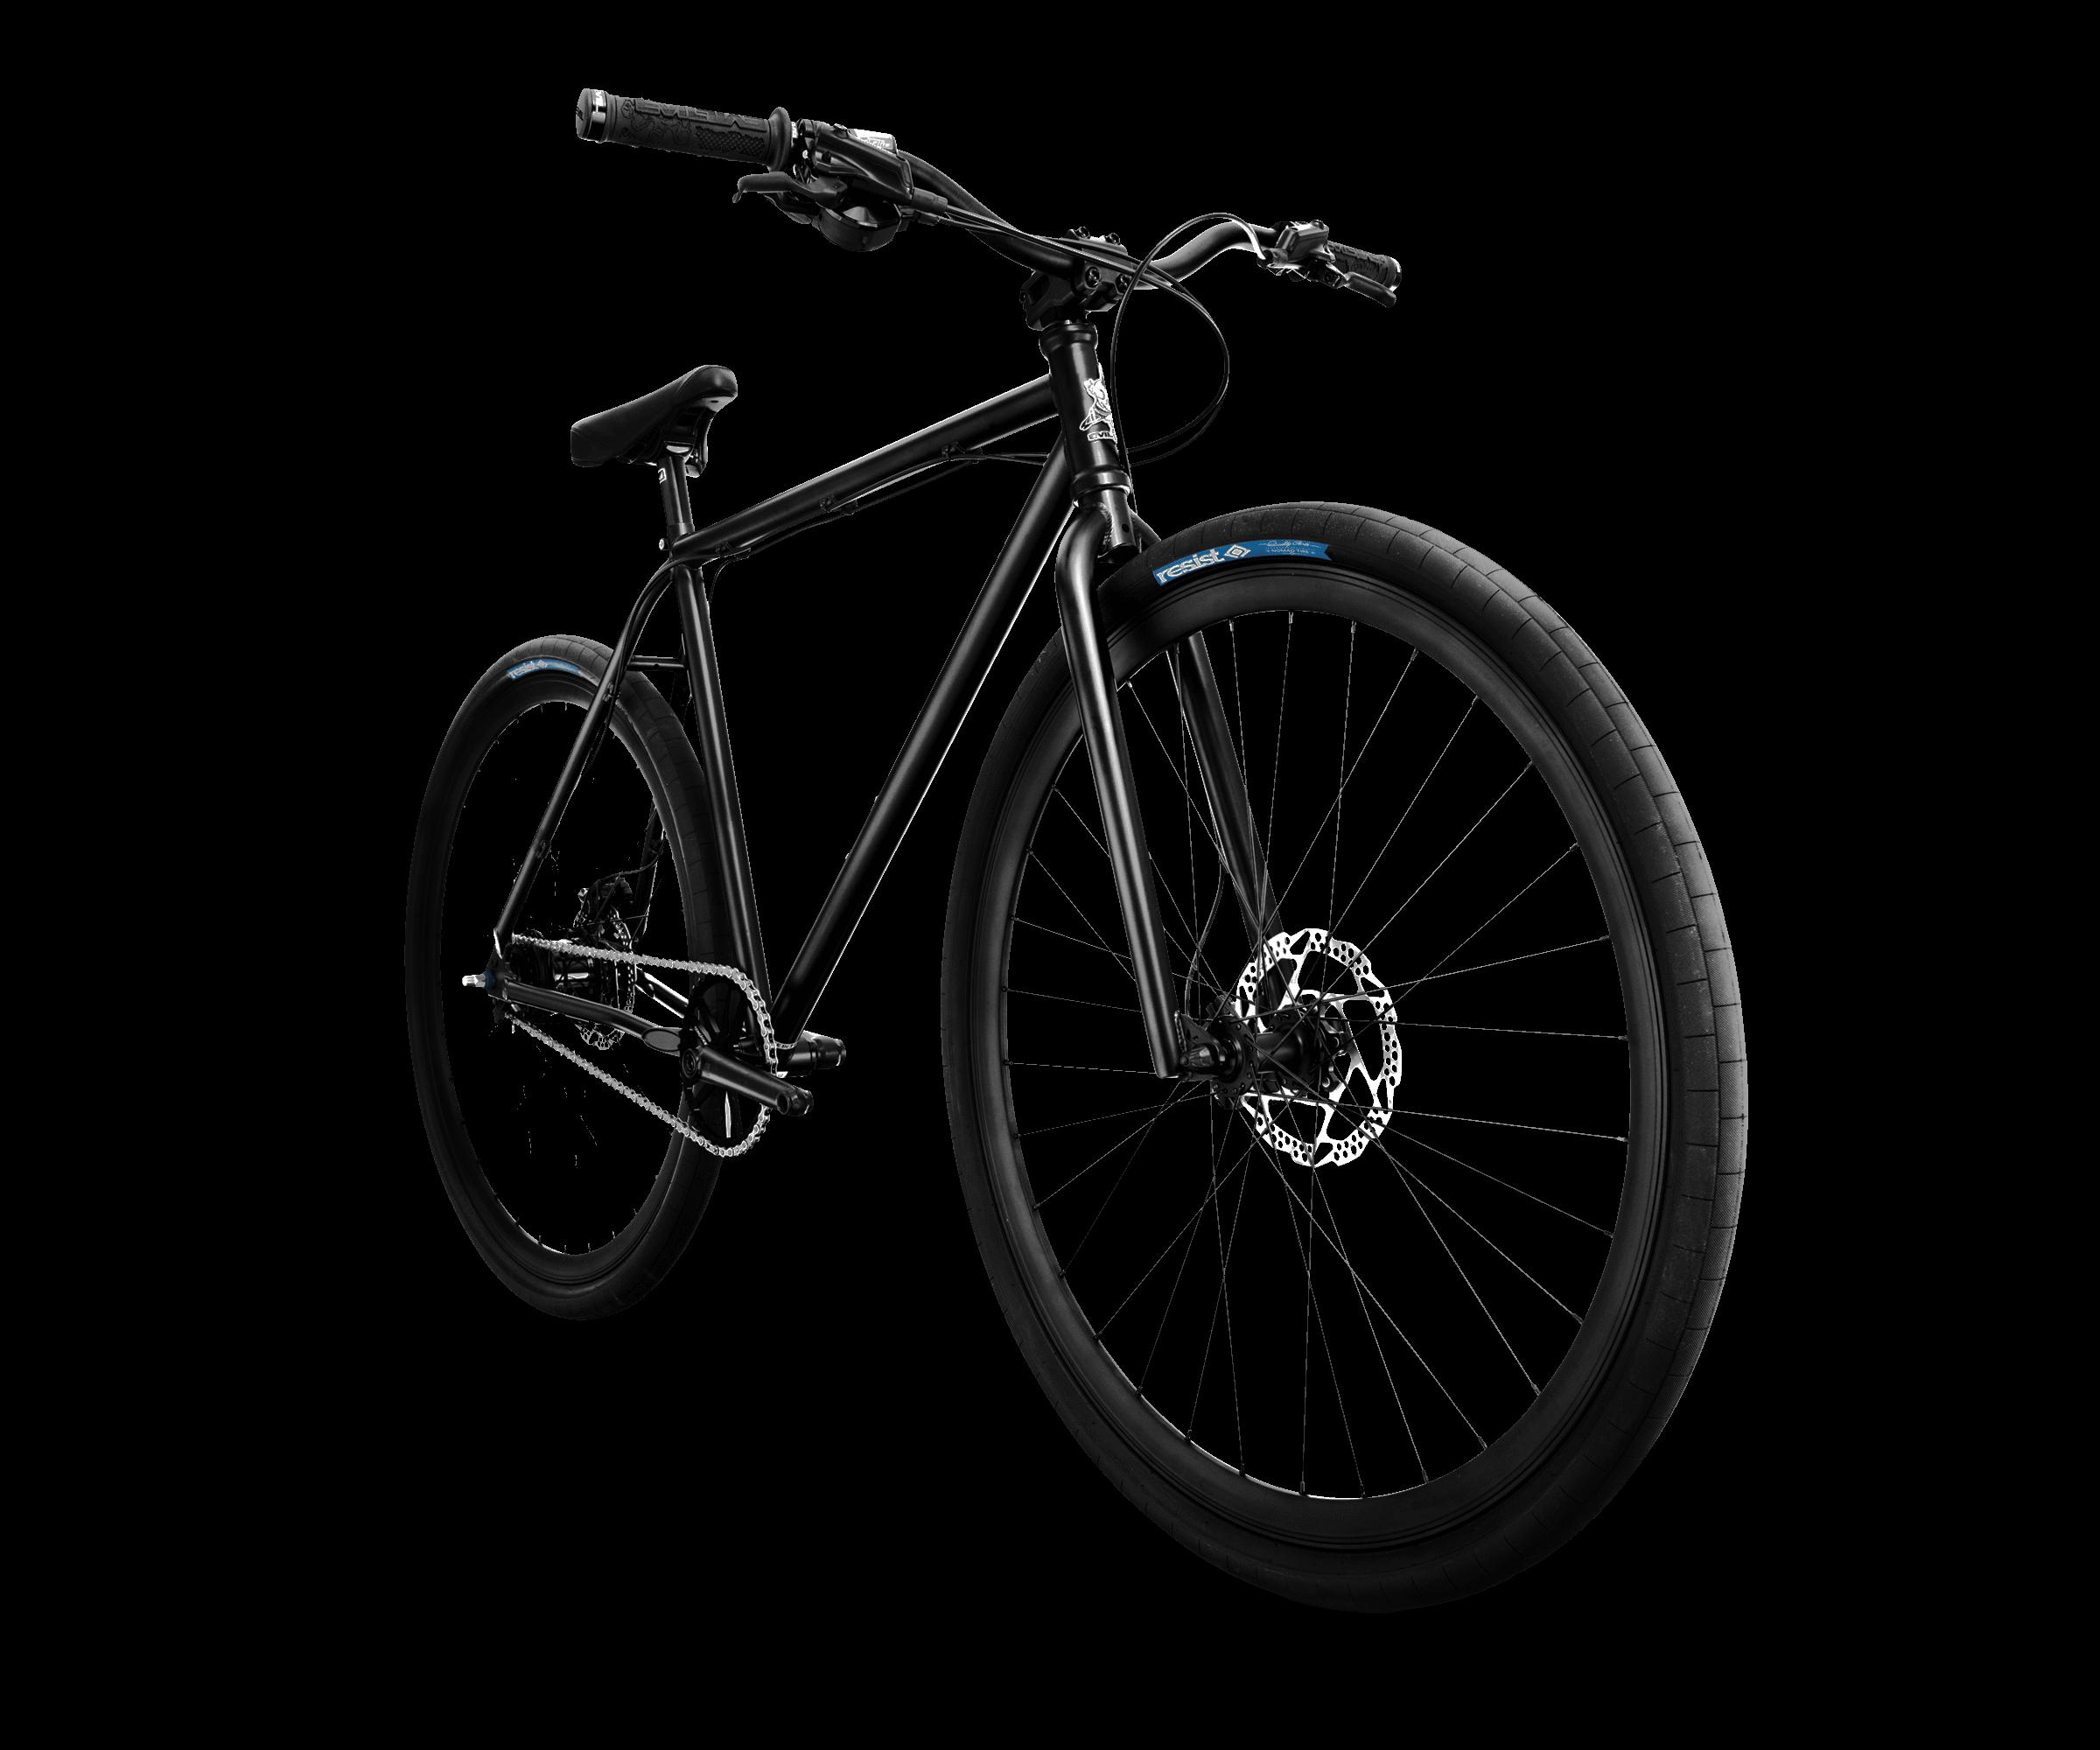 2400x2000 Biking Drawing Bike Bmx Transparent Png Clipart Free Download